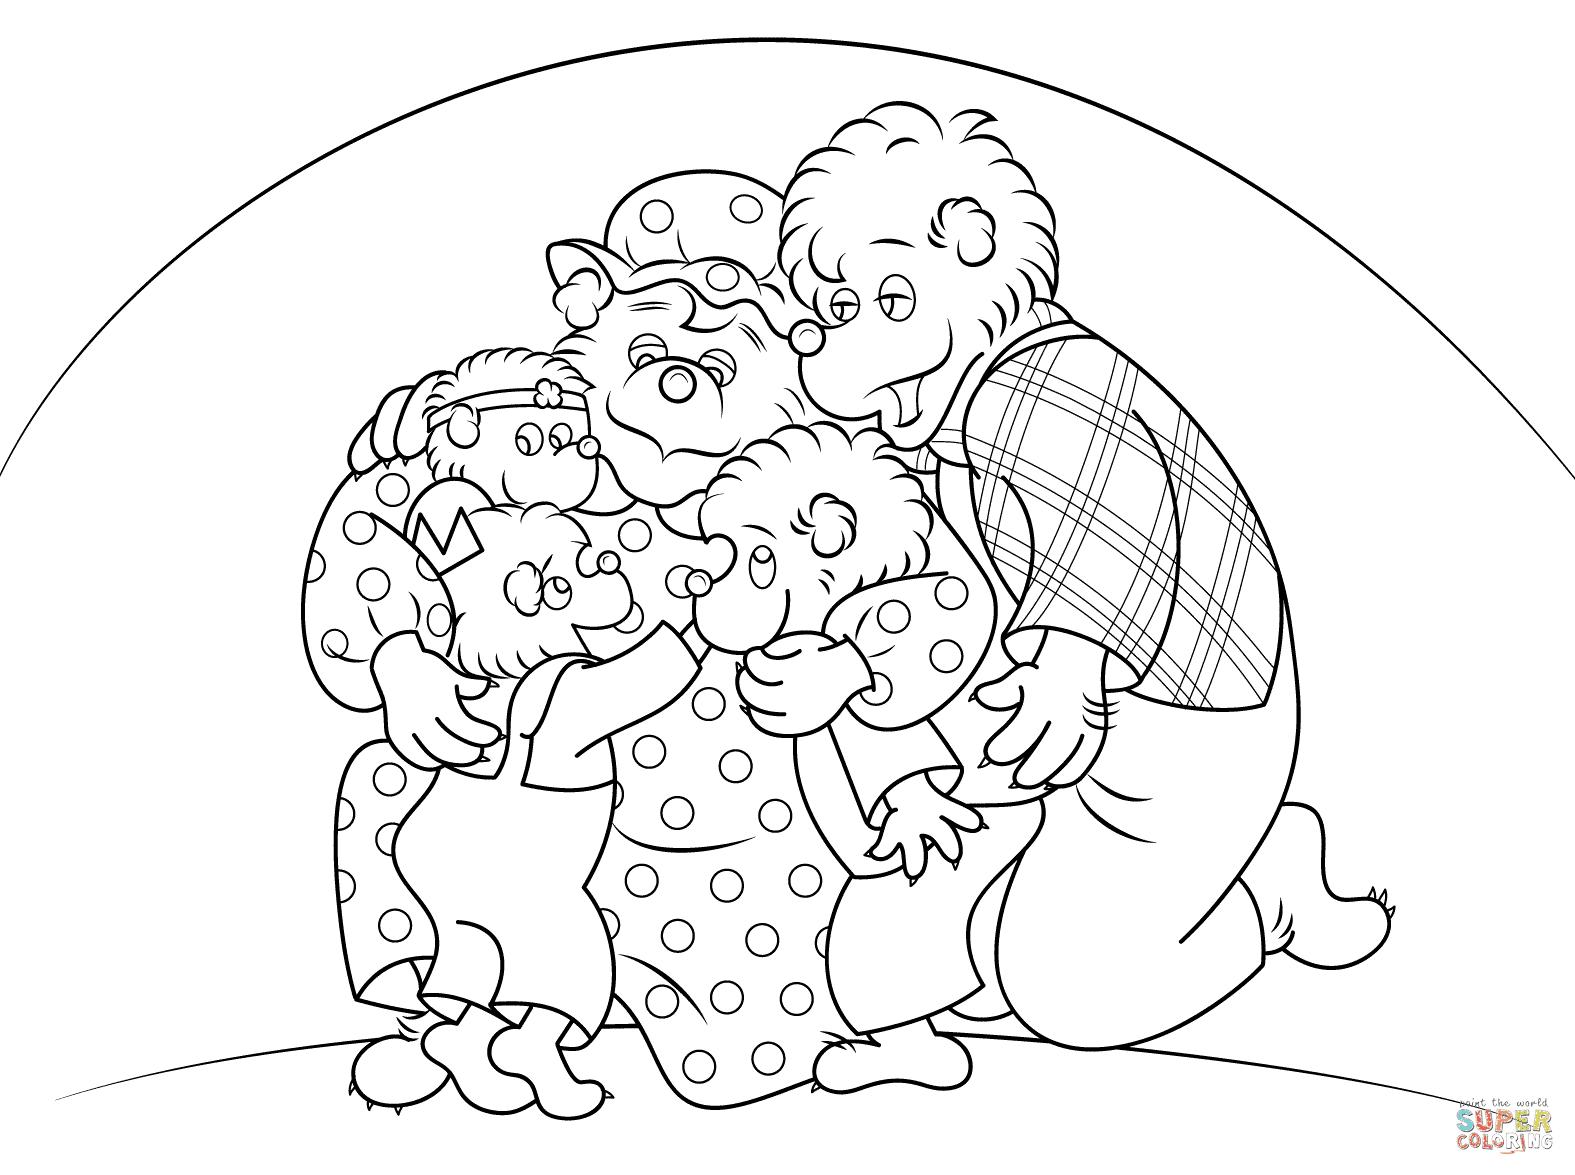 Berenstain Bears are Hugging